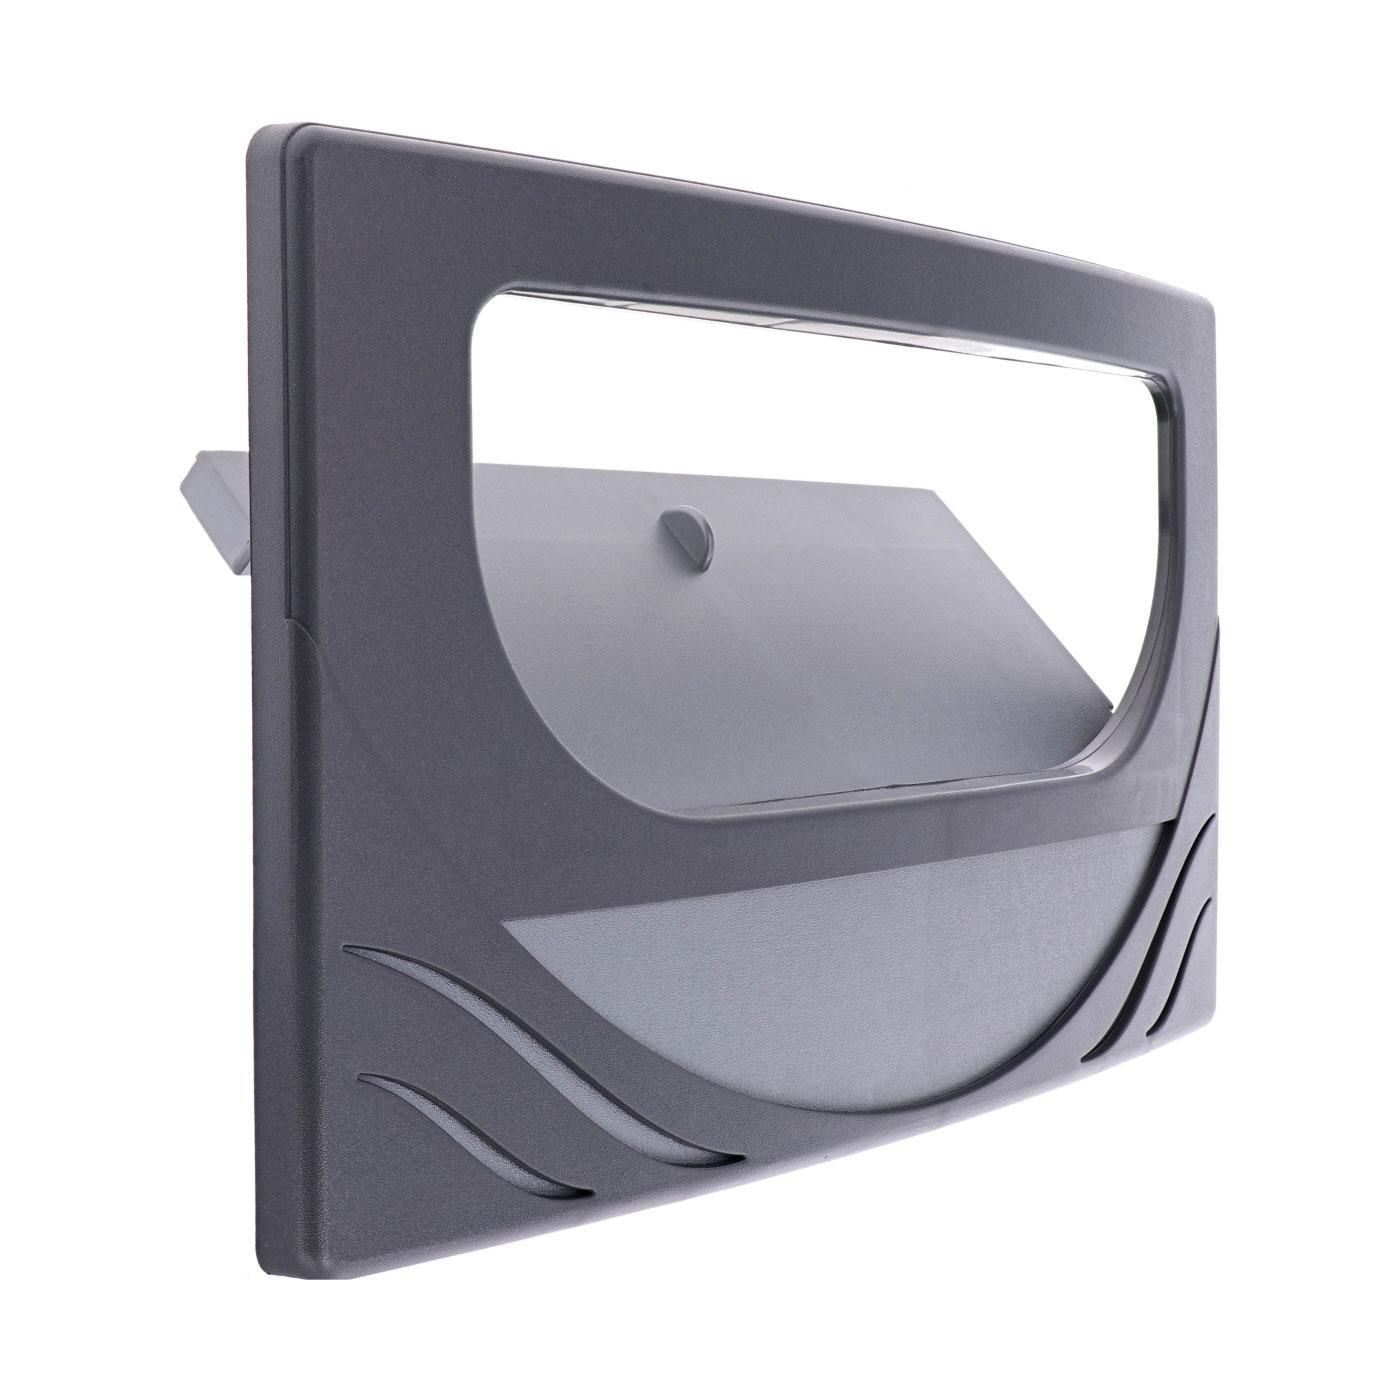 CMP Front Access skimmer faceplate